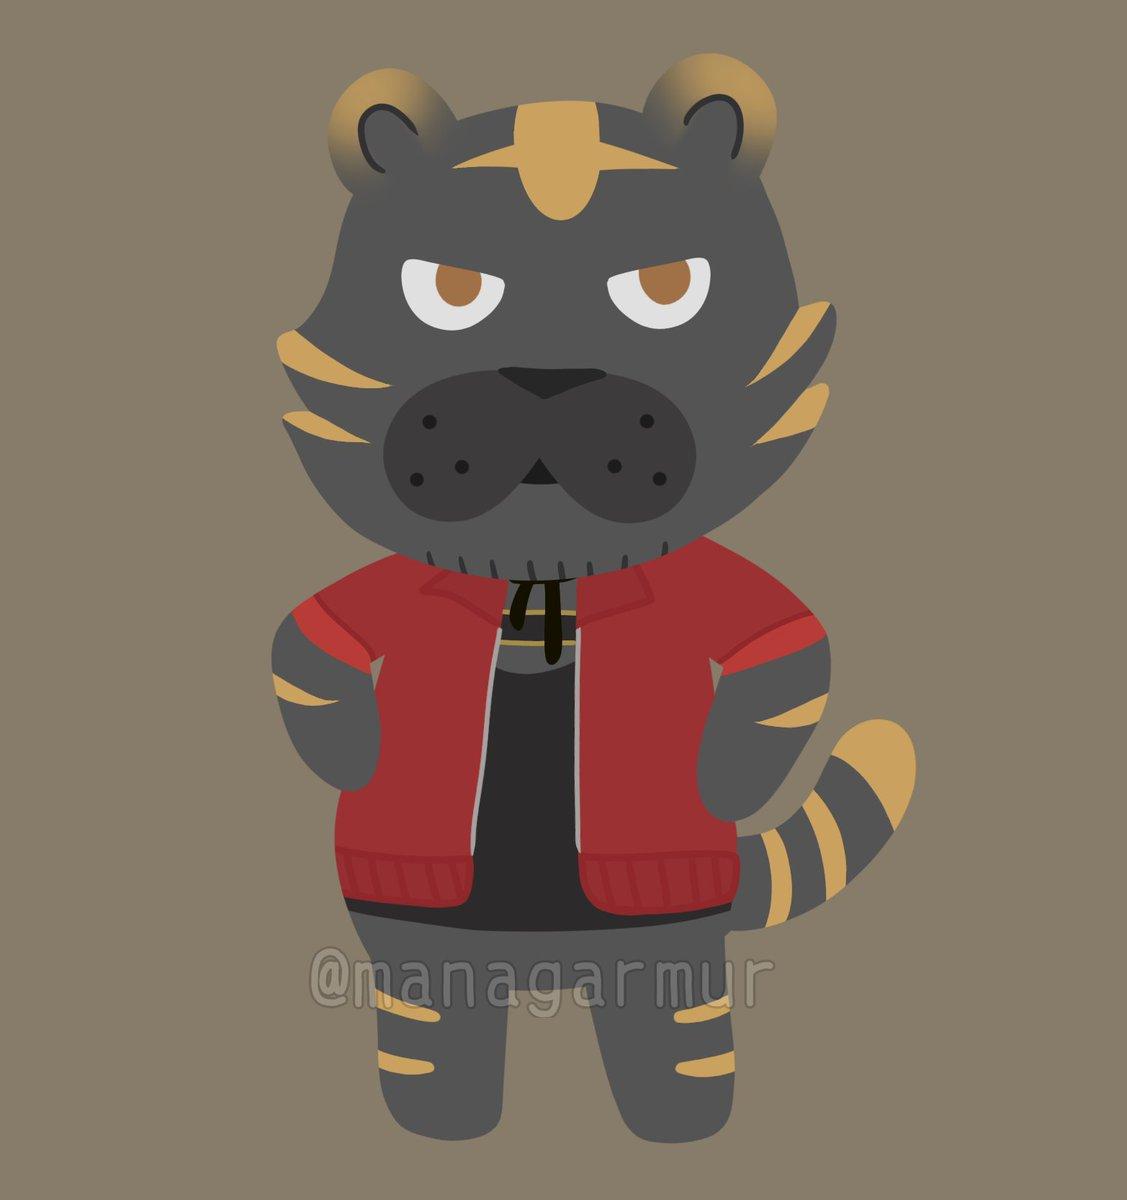 Touken Ranbu X Animal Crossing🍃 Tiger Nagasone for @itsukisser !